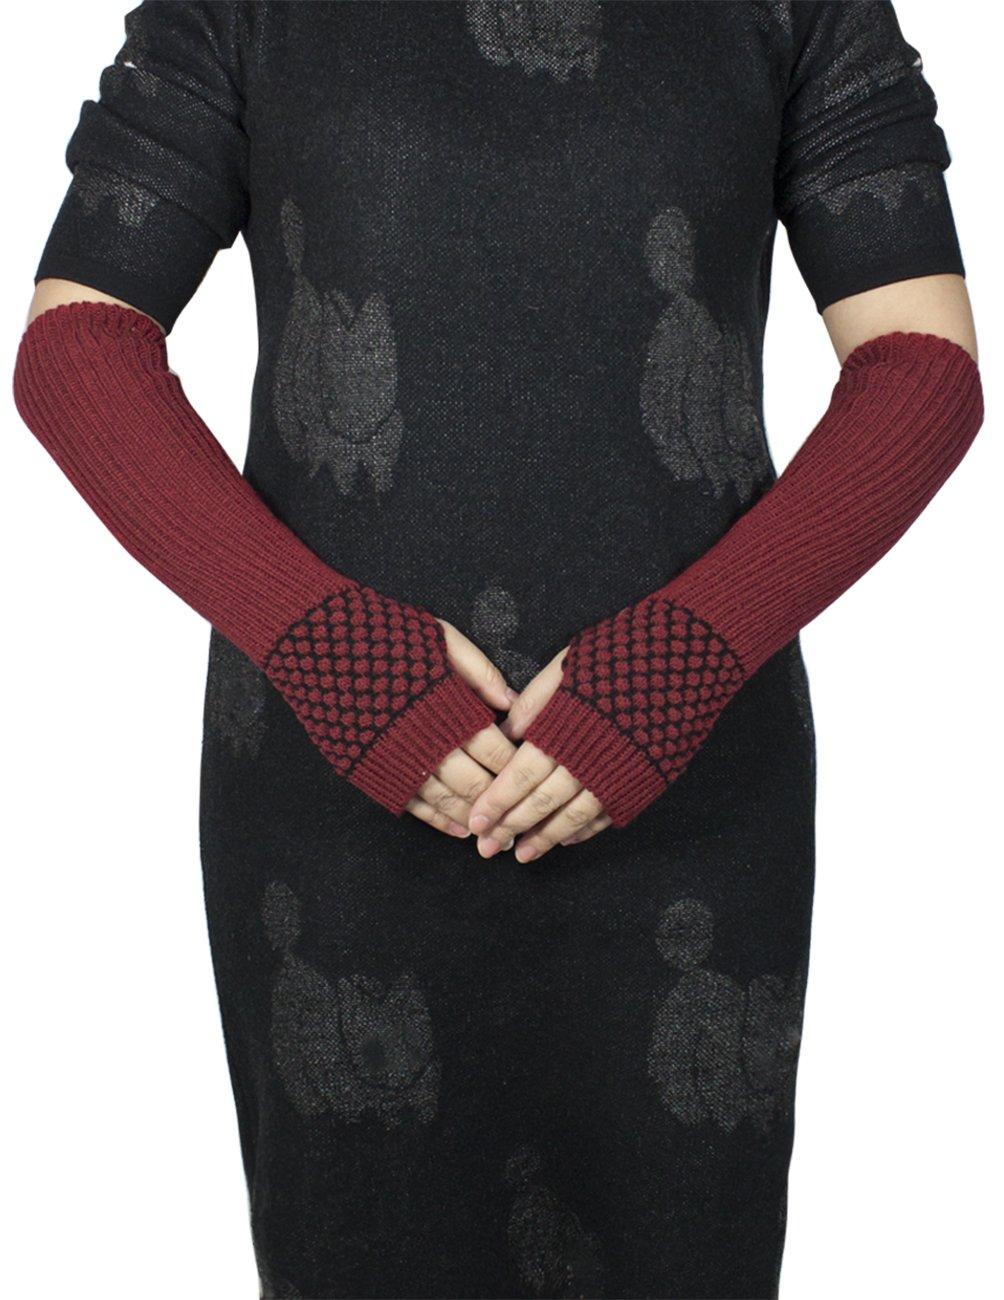 Dahlia Women's Honeycomb Pattern Acrylic Fingerless Arm Warmer Gloves - Red by Dahlia (Image #2)